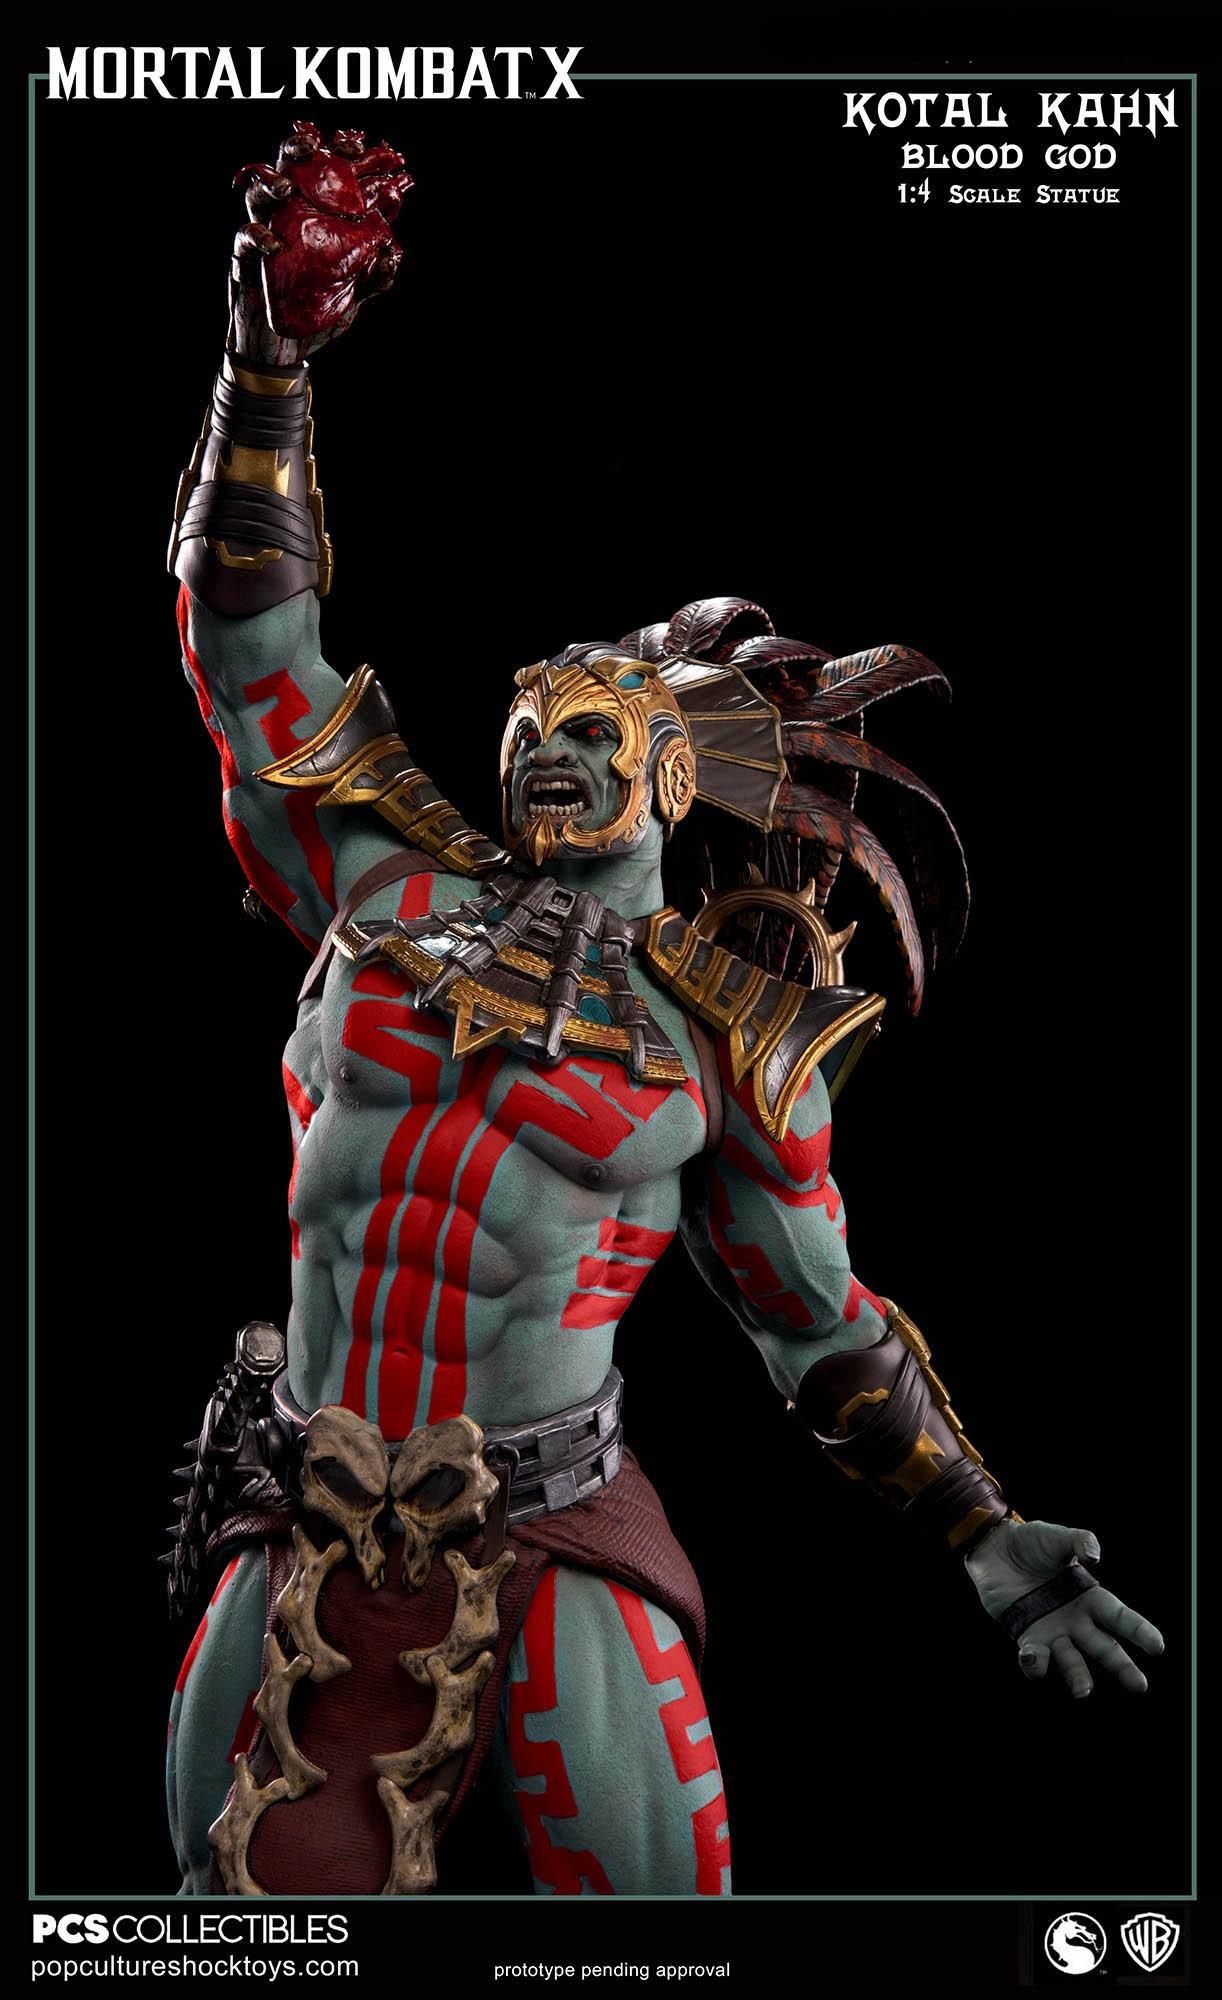 [Pop Culture Shock] Mortal Kombat X: Kotal Kahn 1:4 scale PCS-Kotal-Kahn-Blood-God-011